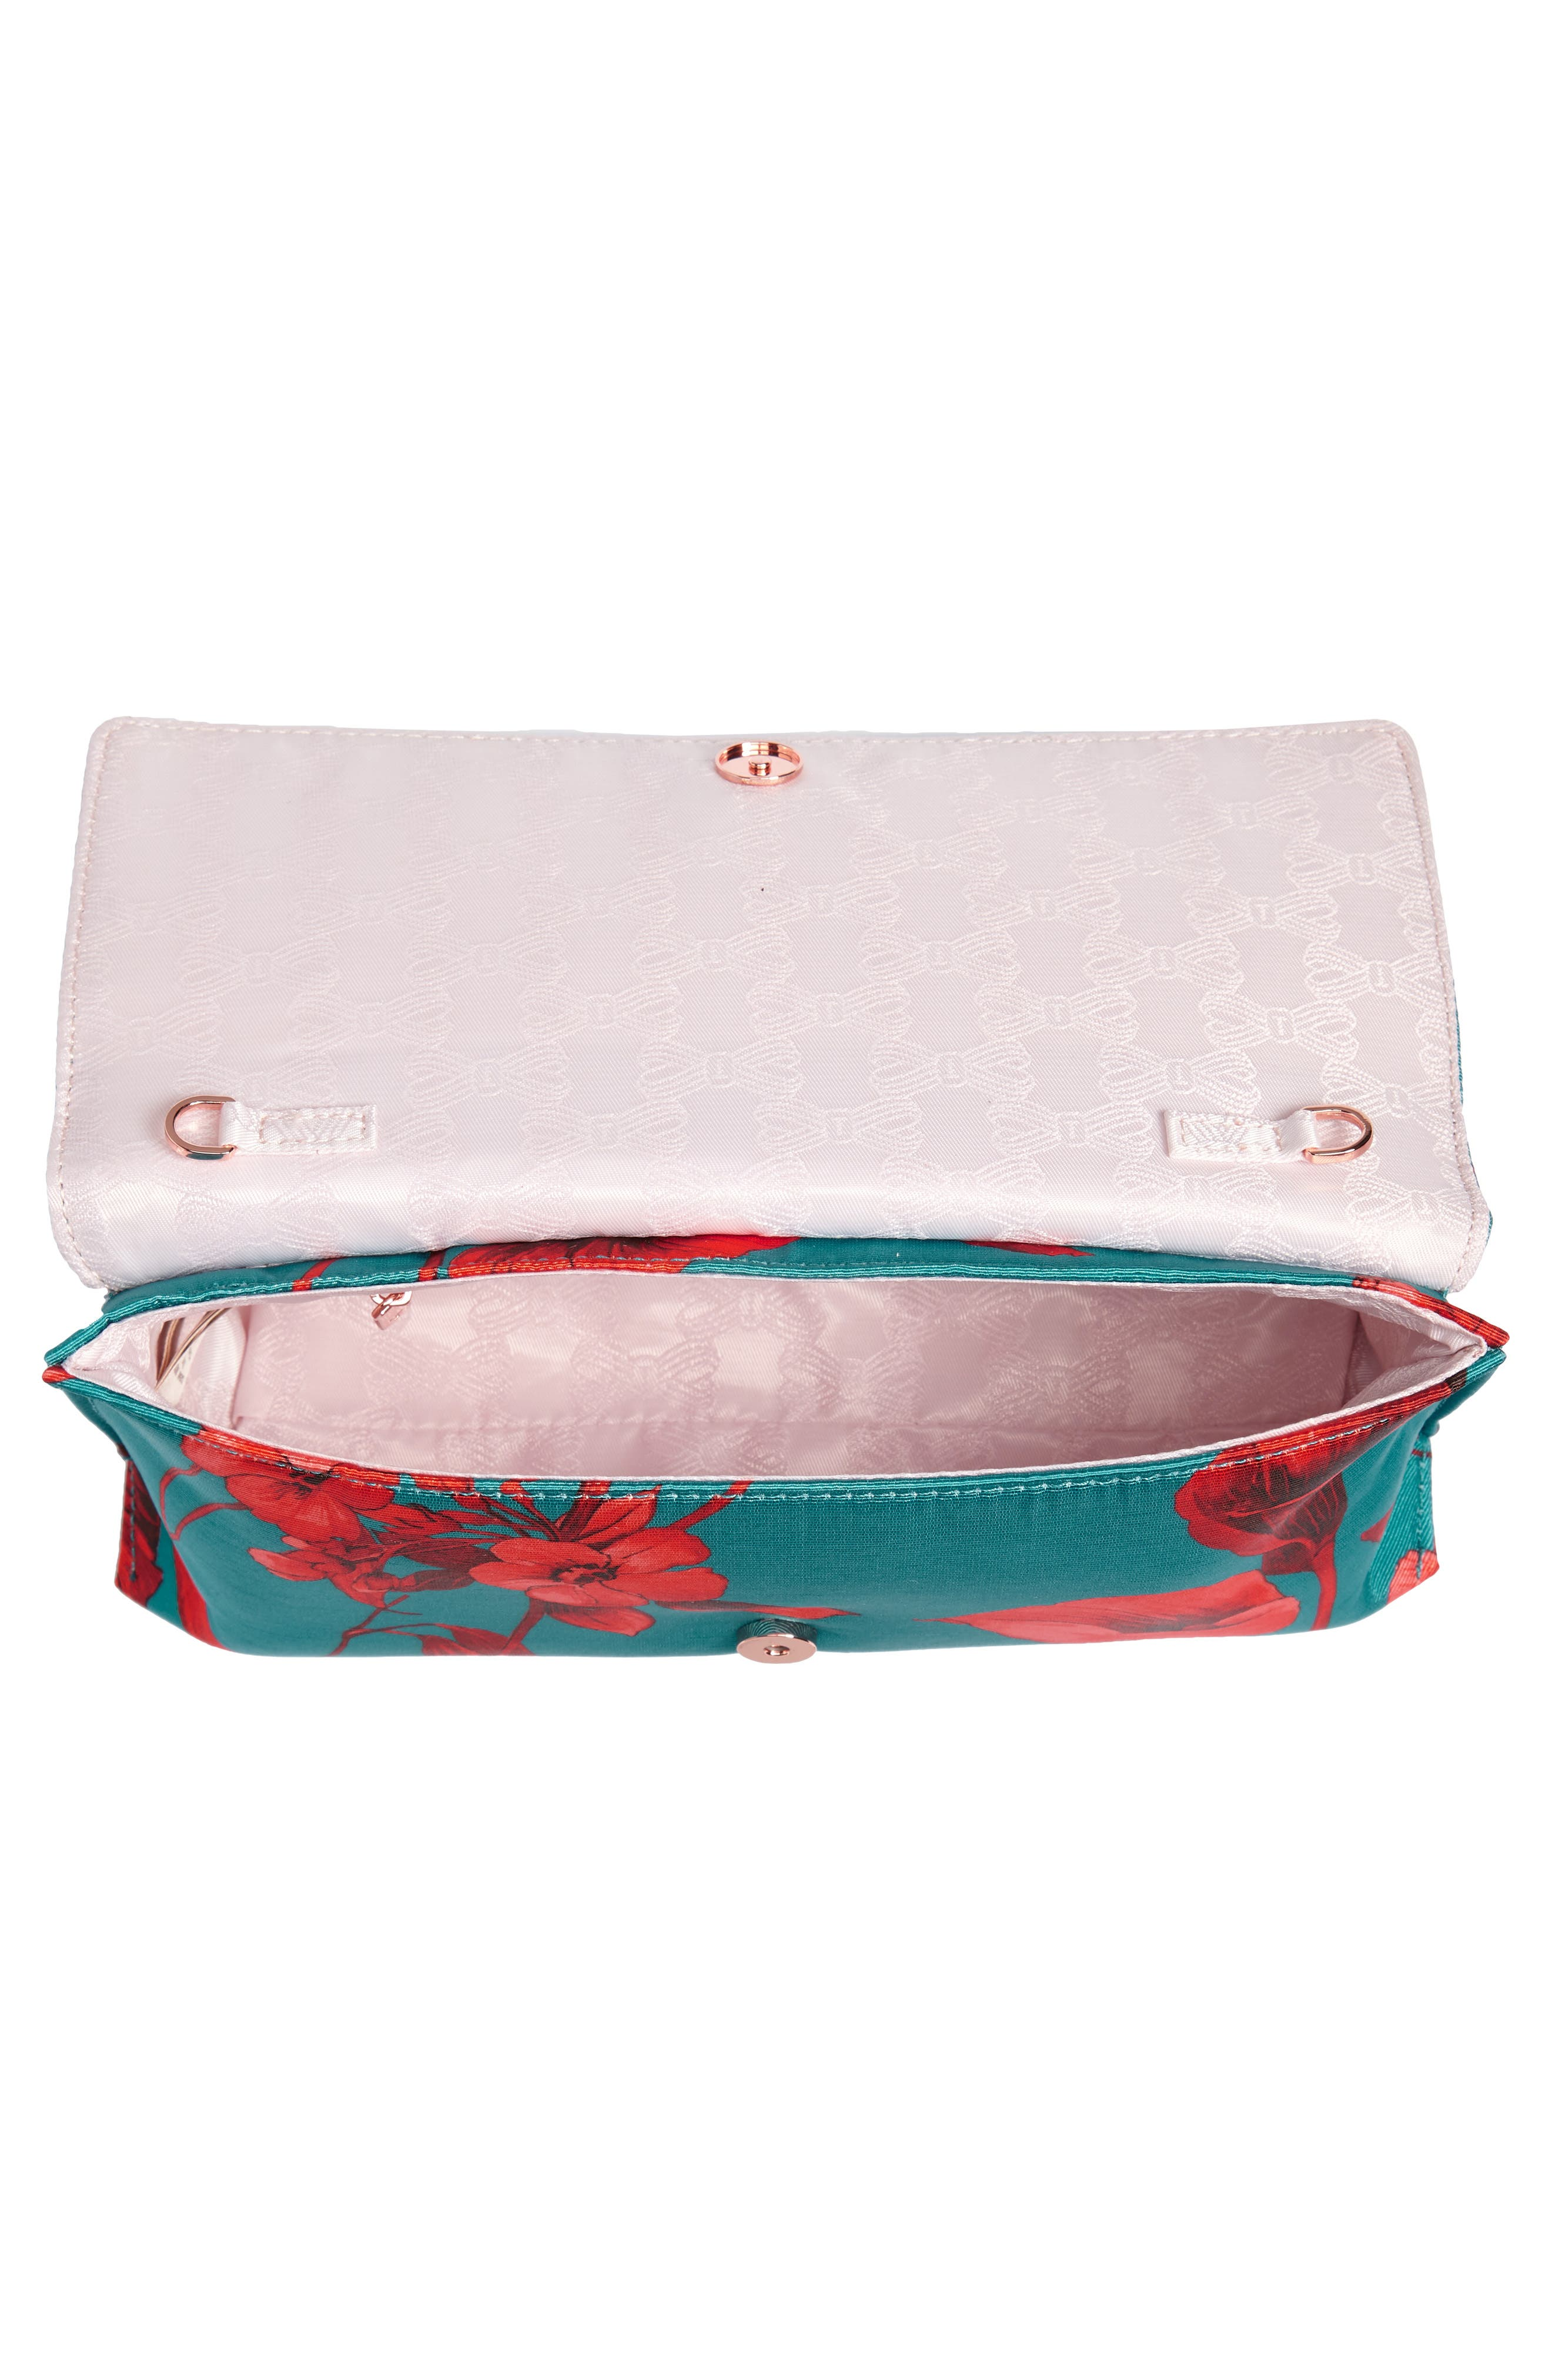 Darlee Fantasia Tassel Bag,                             Alternate thumbnail 5, color,                             TURQUOISE